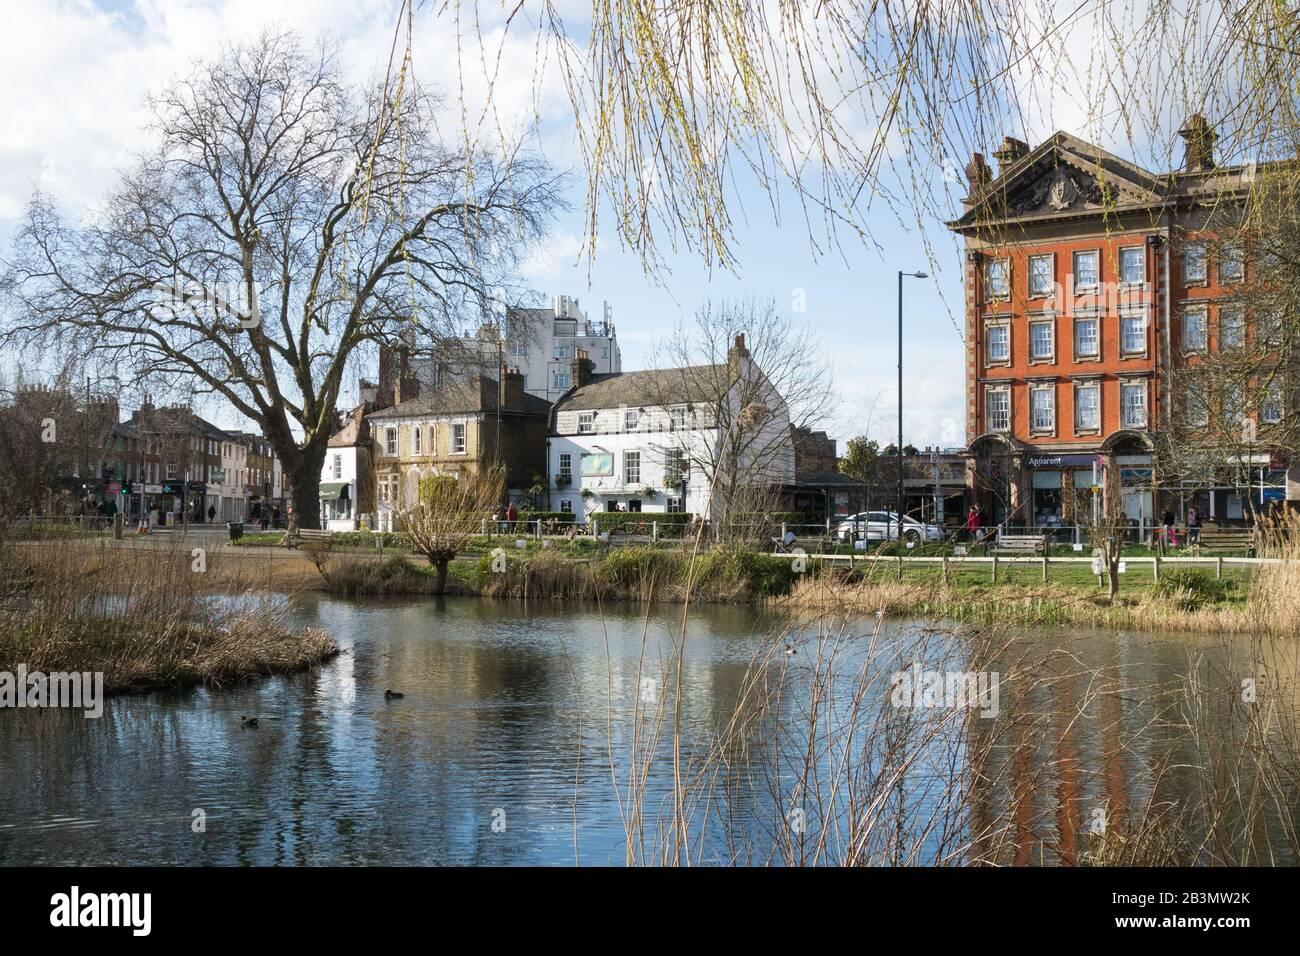 The Sun Inn and Barnes Pond in southwest London, UK Stock Photo